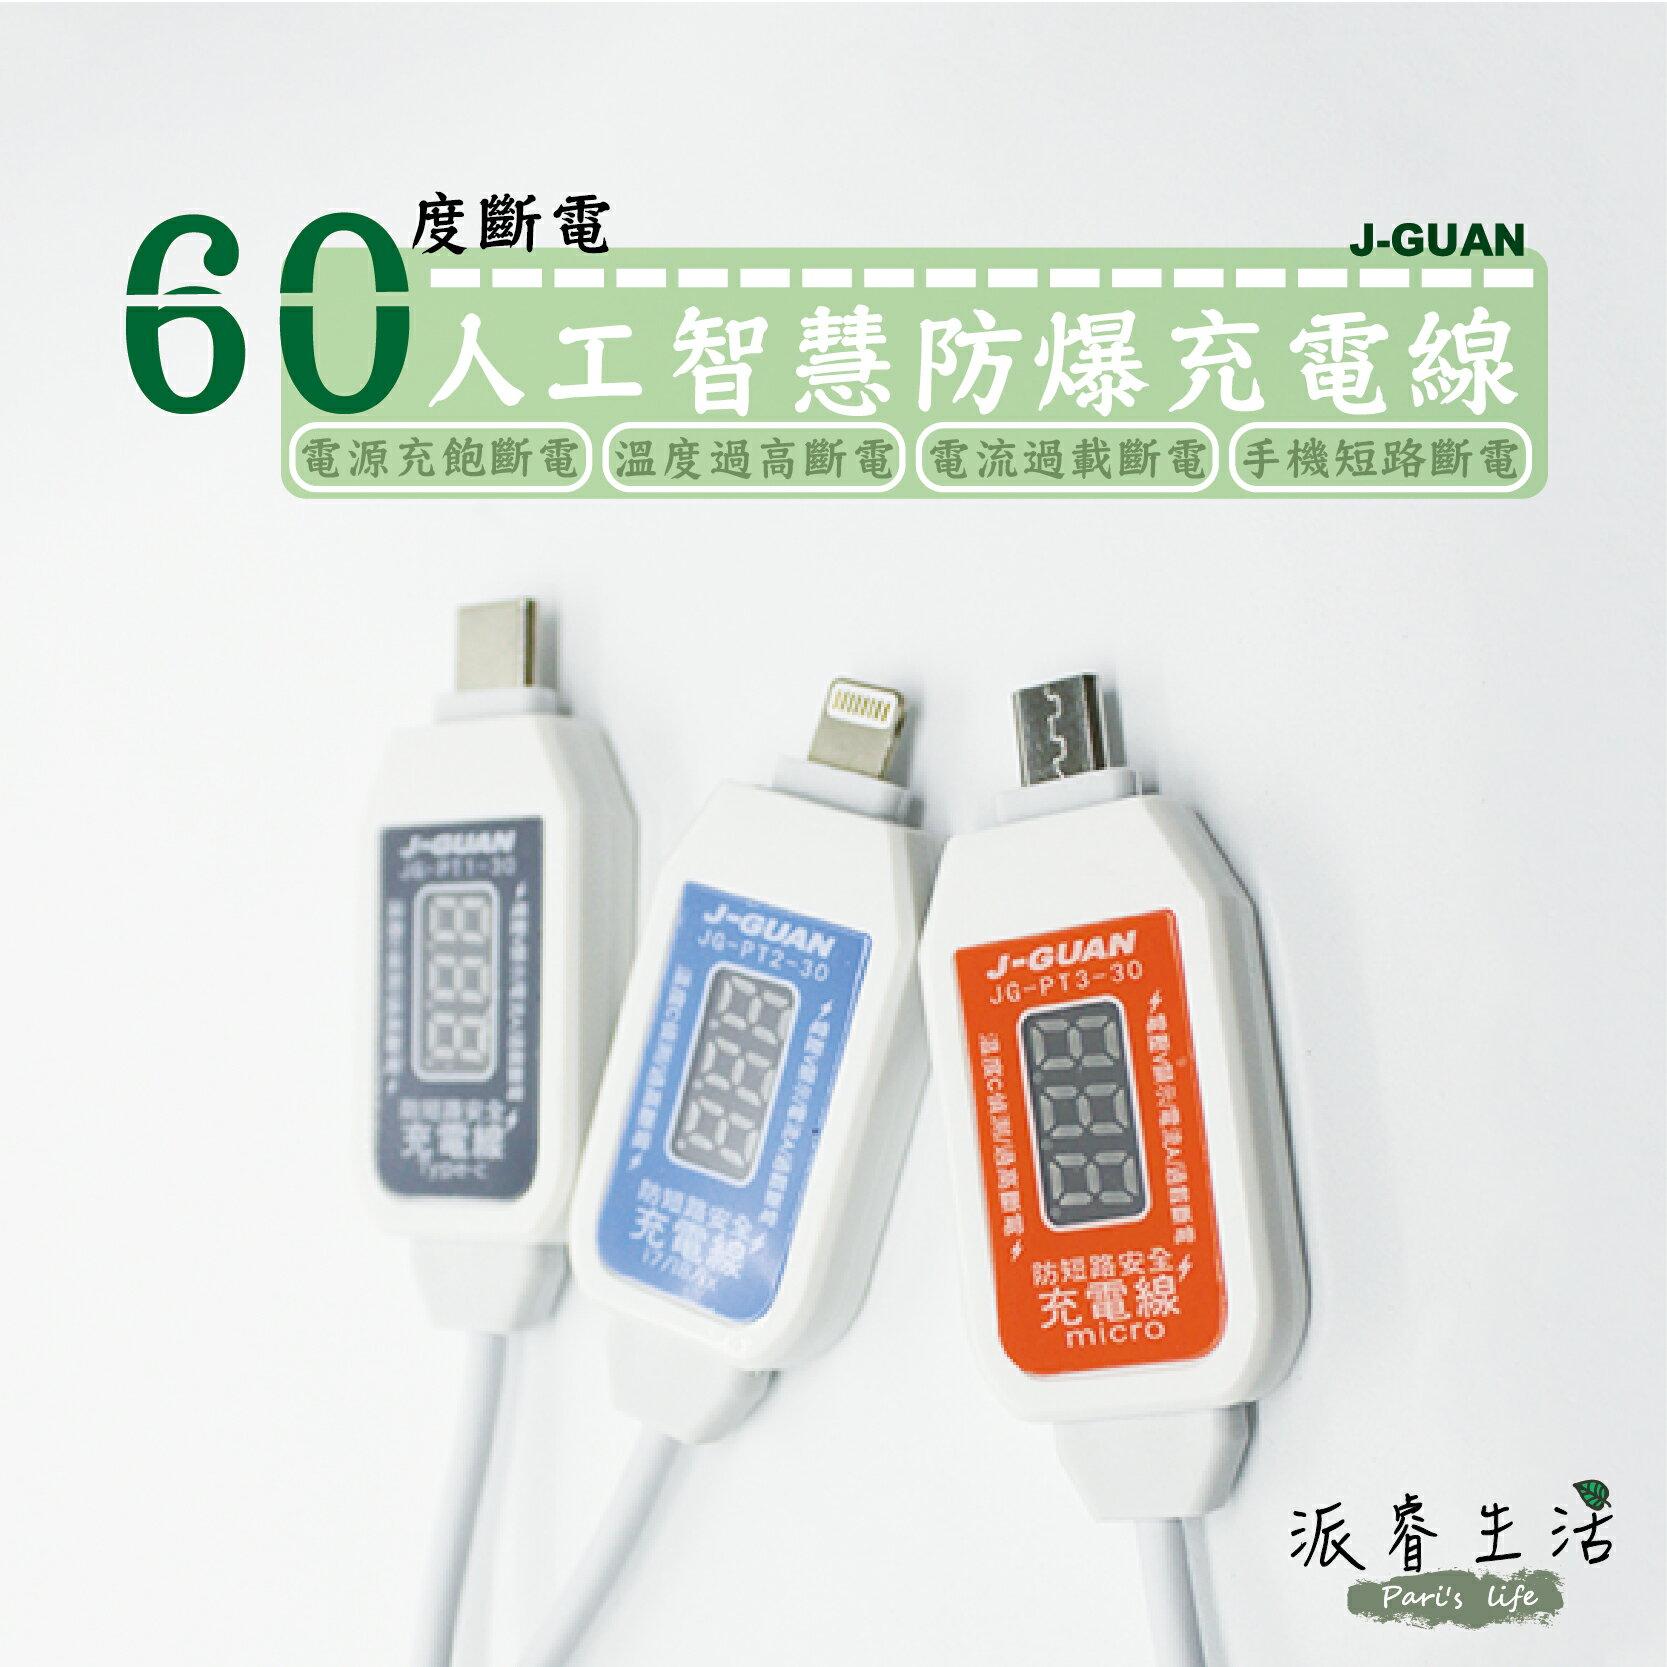 【J-GUAN 人工智慧防爆充電線】智能斷電/顯示/過熱偵測/防爆【LD024】